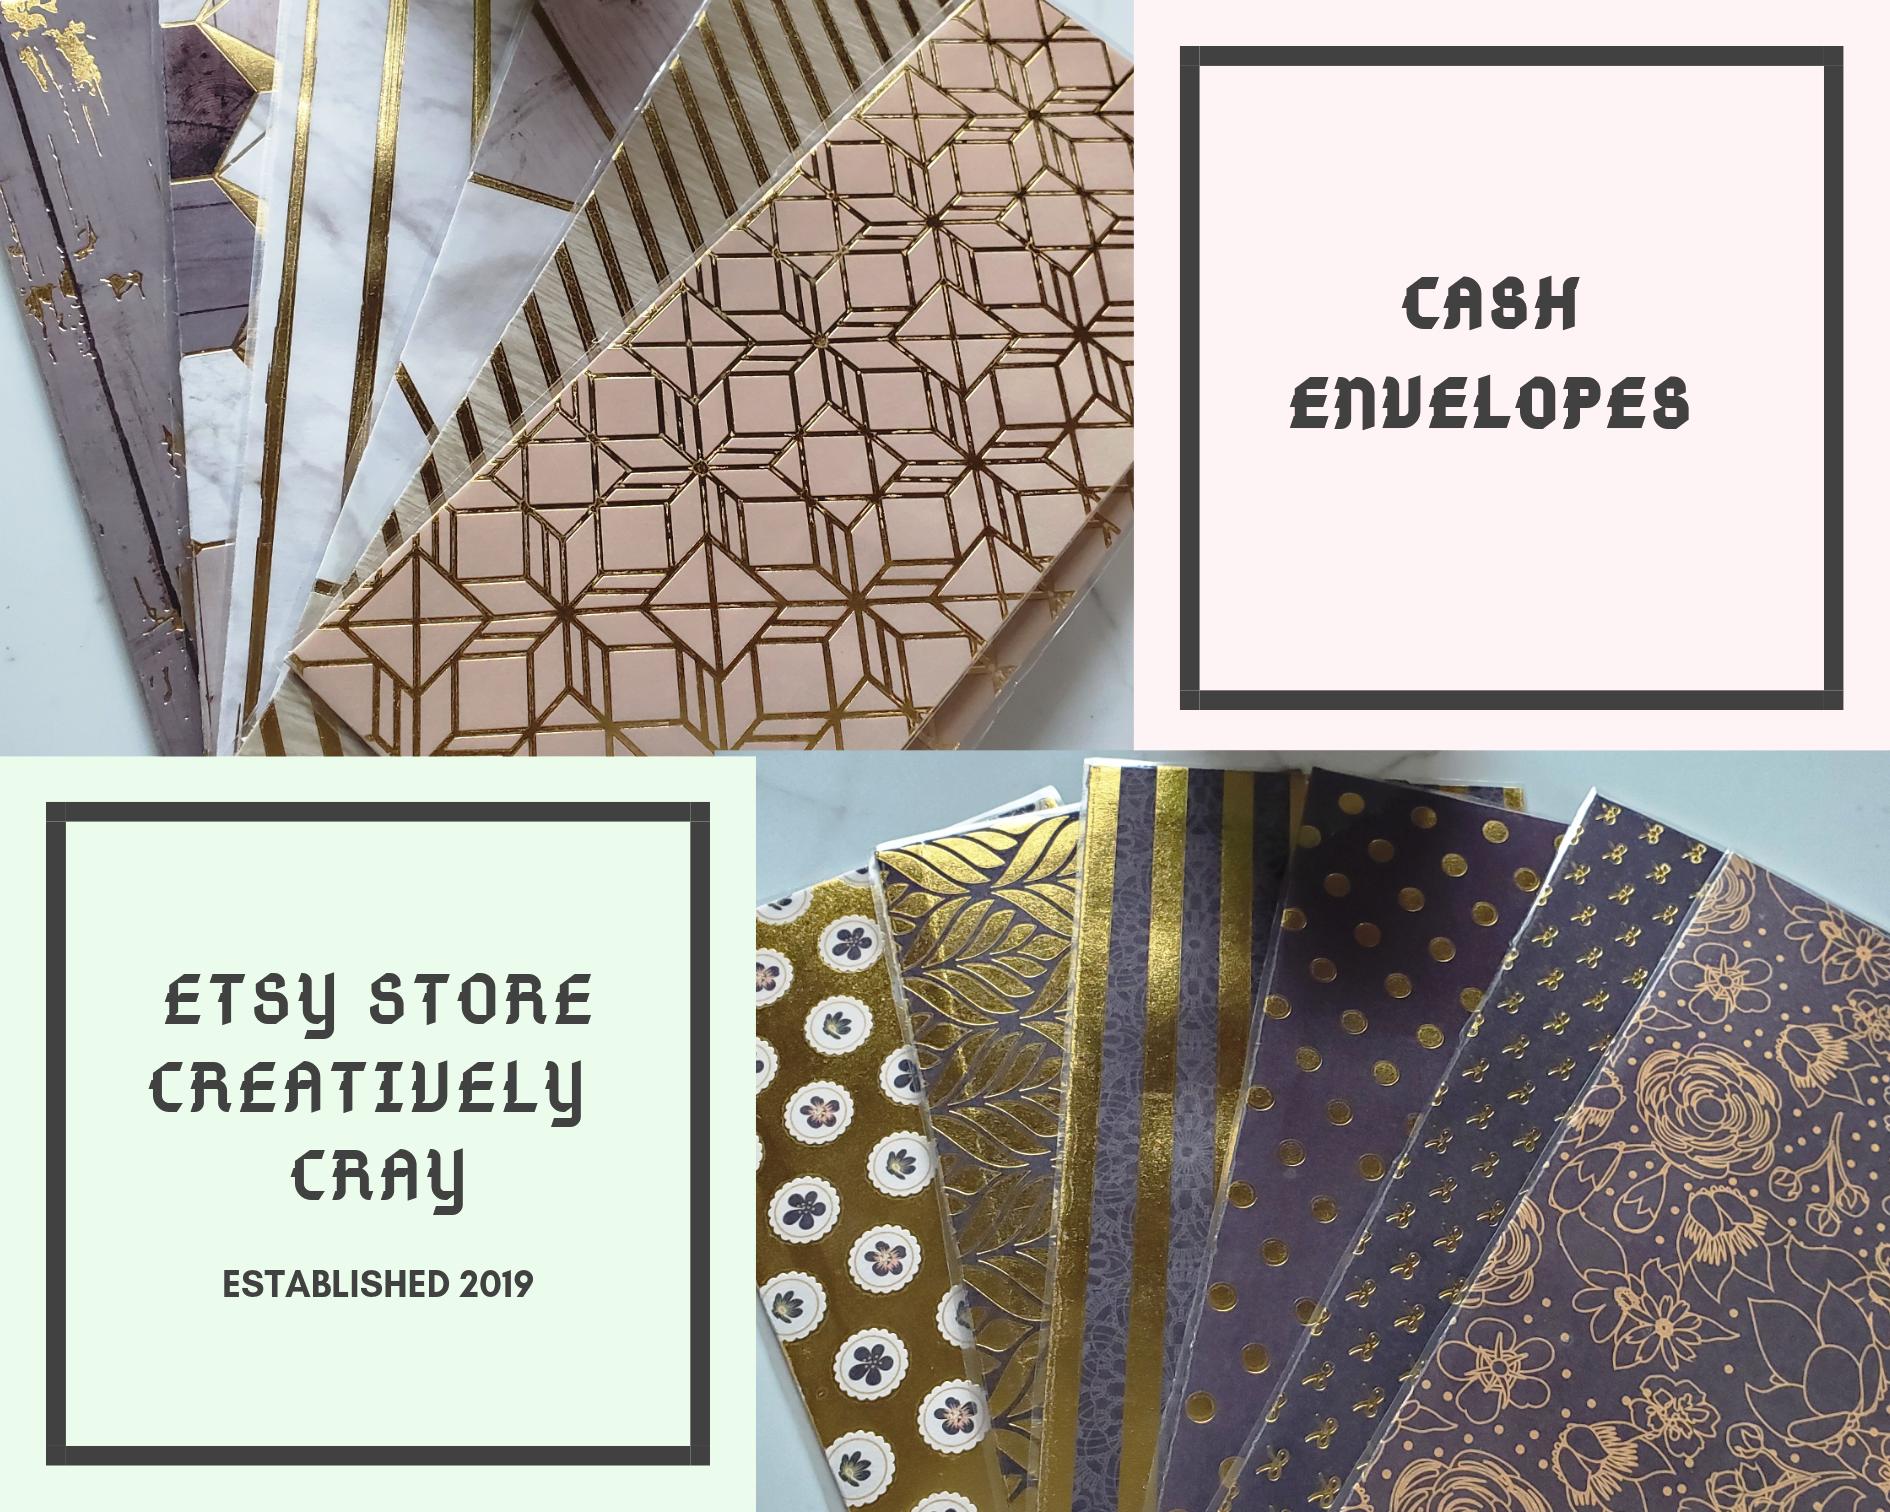 Etsy Store Cash Envelopes.png